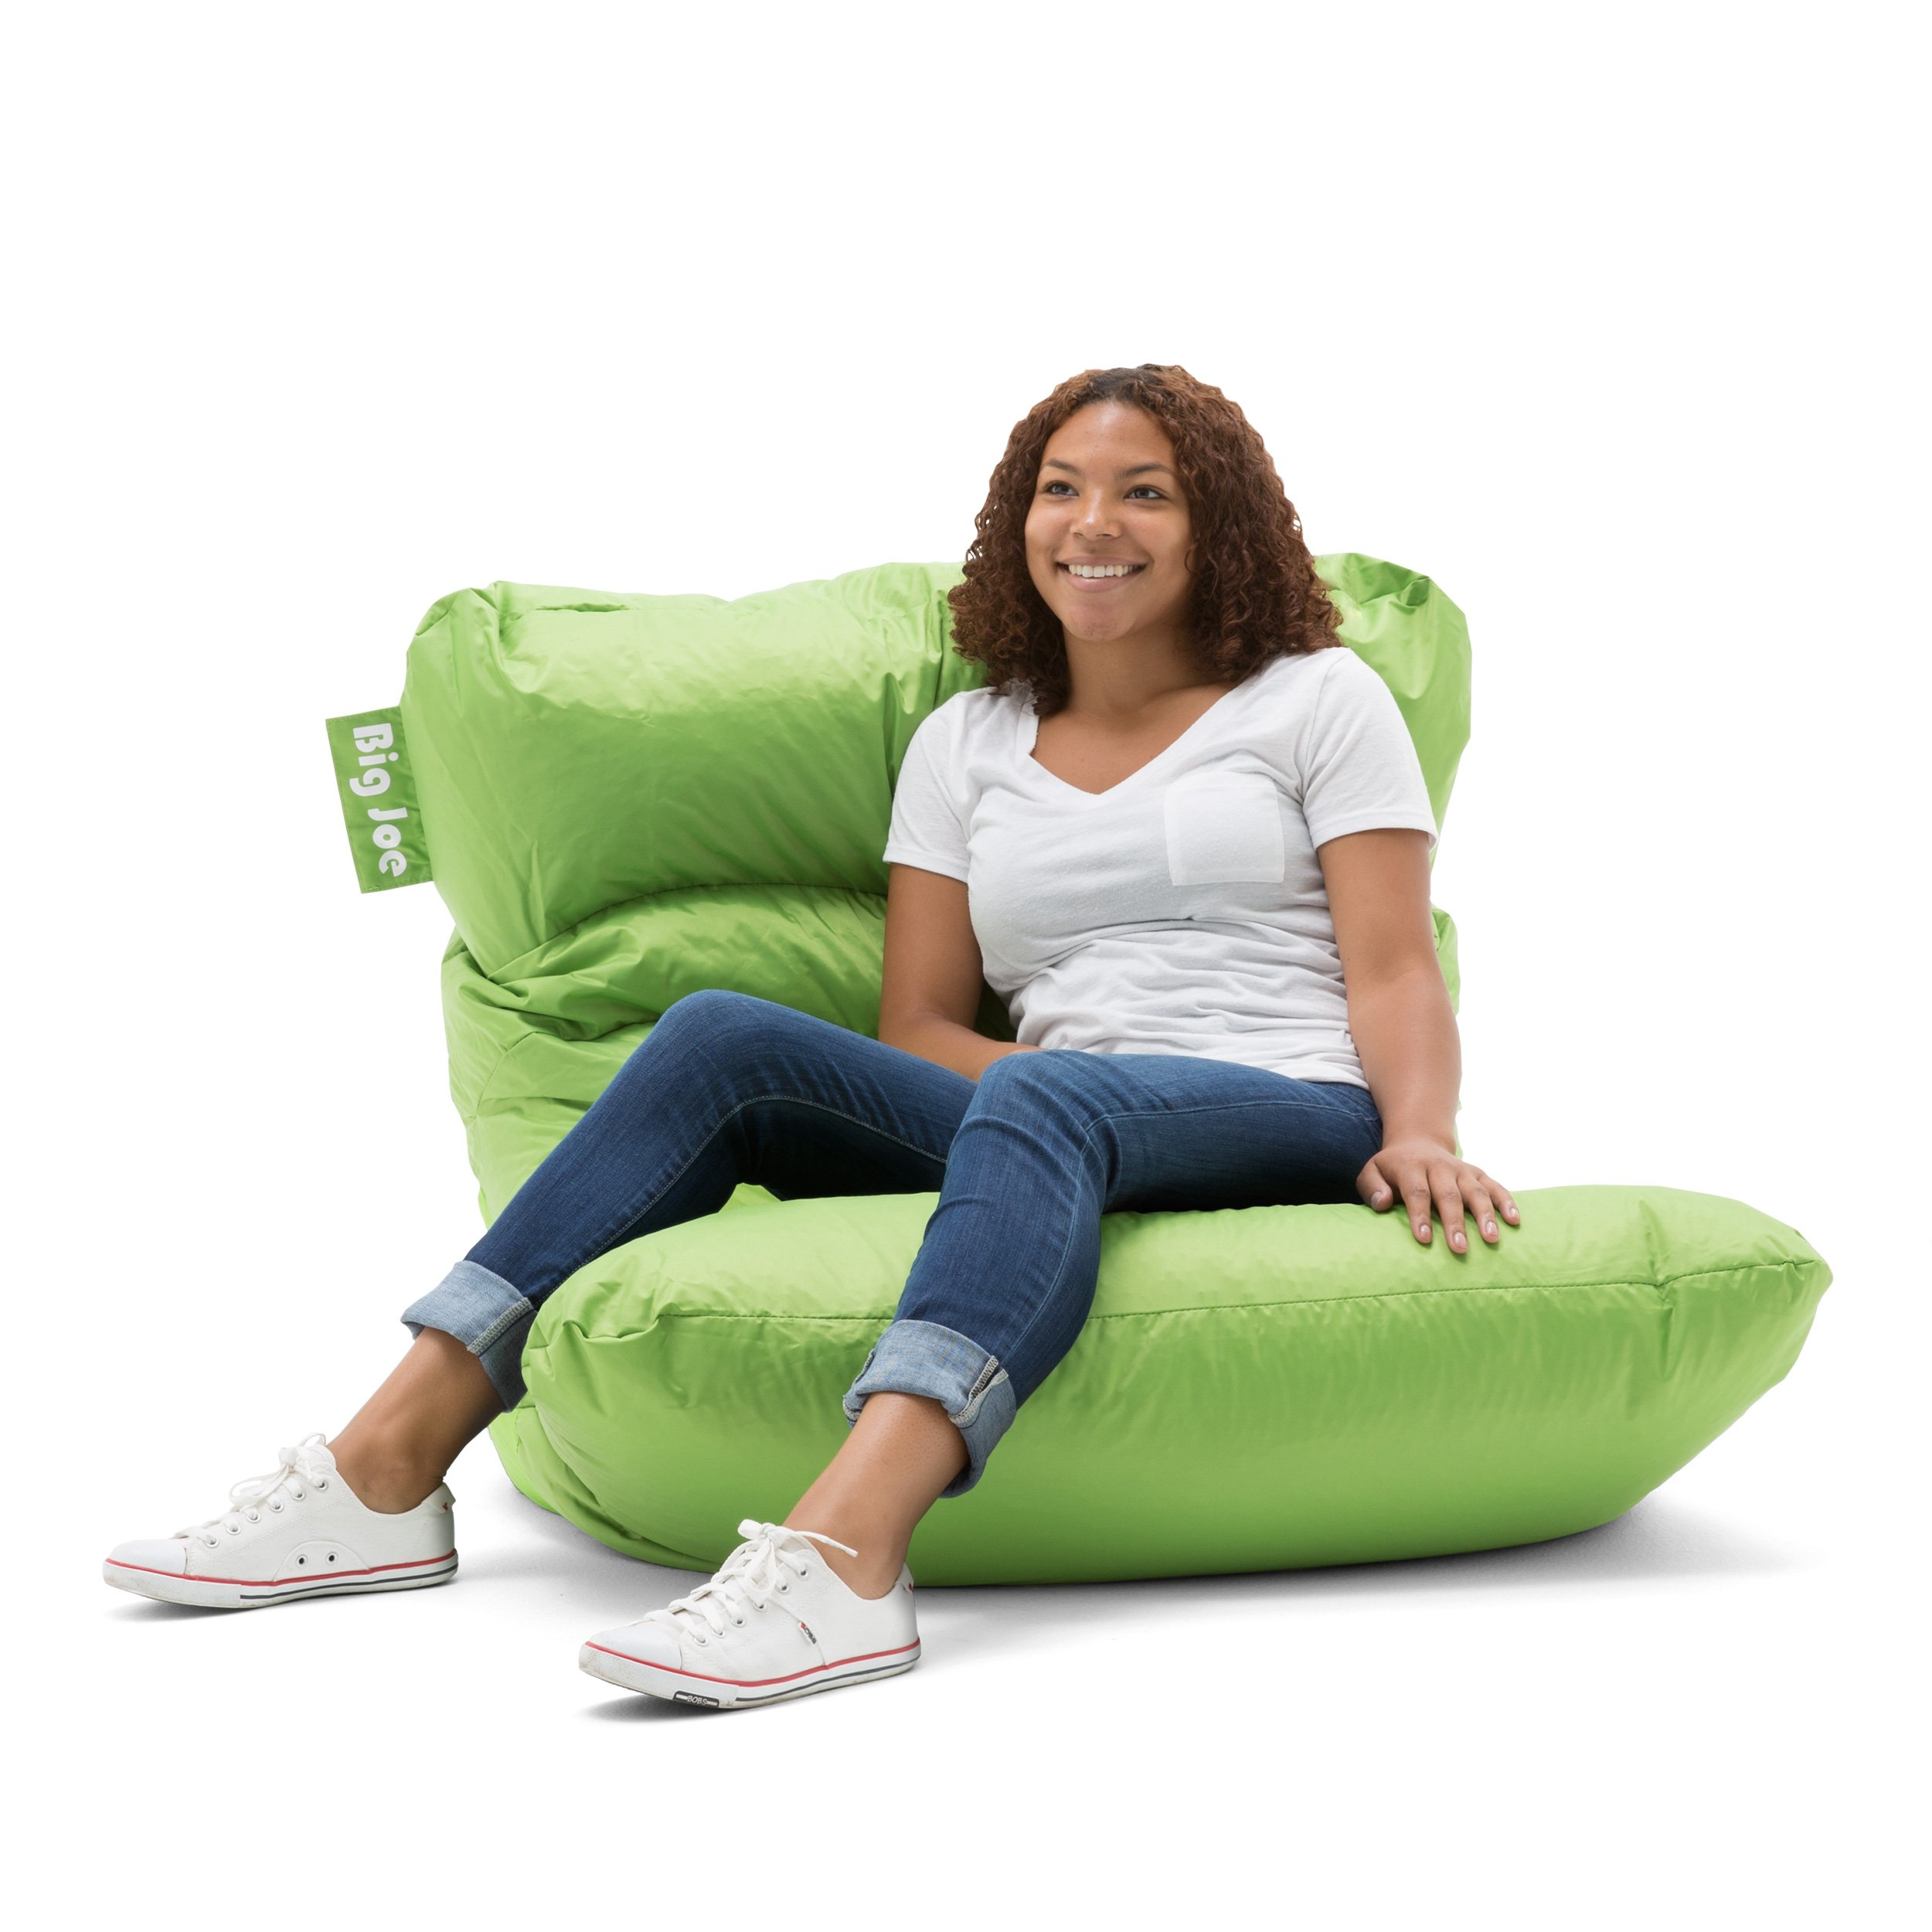 Big Joe Roma Bean Bag Chair, Spicy Lime by Big Joe